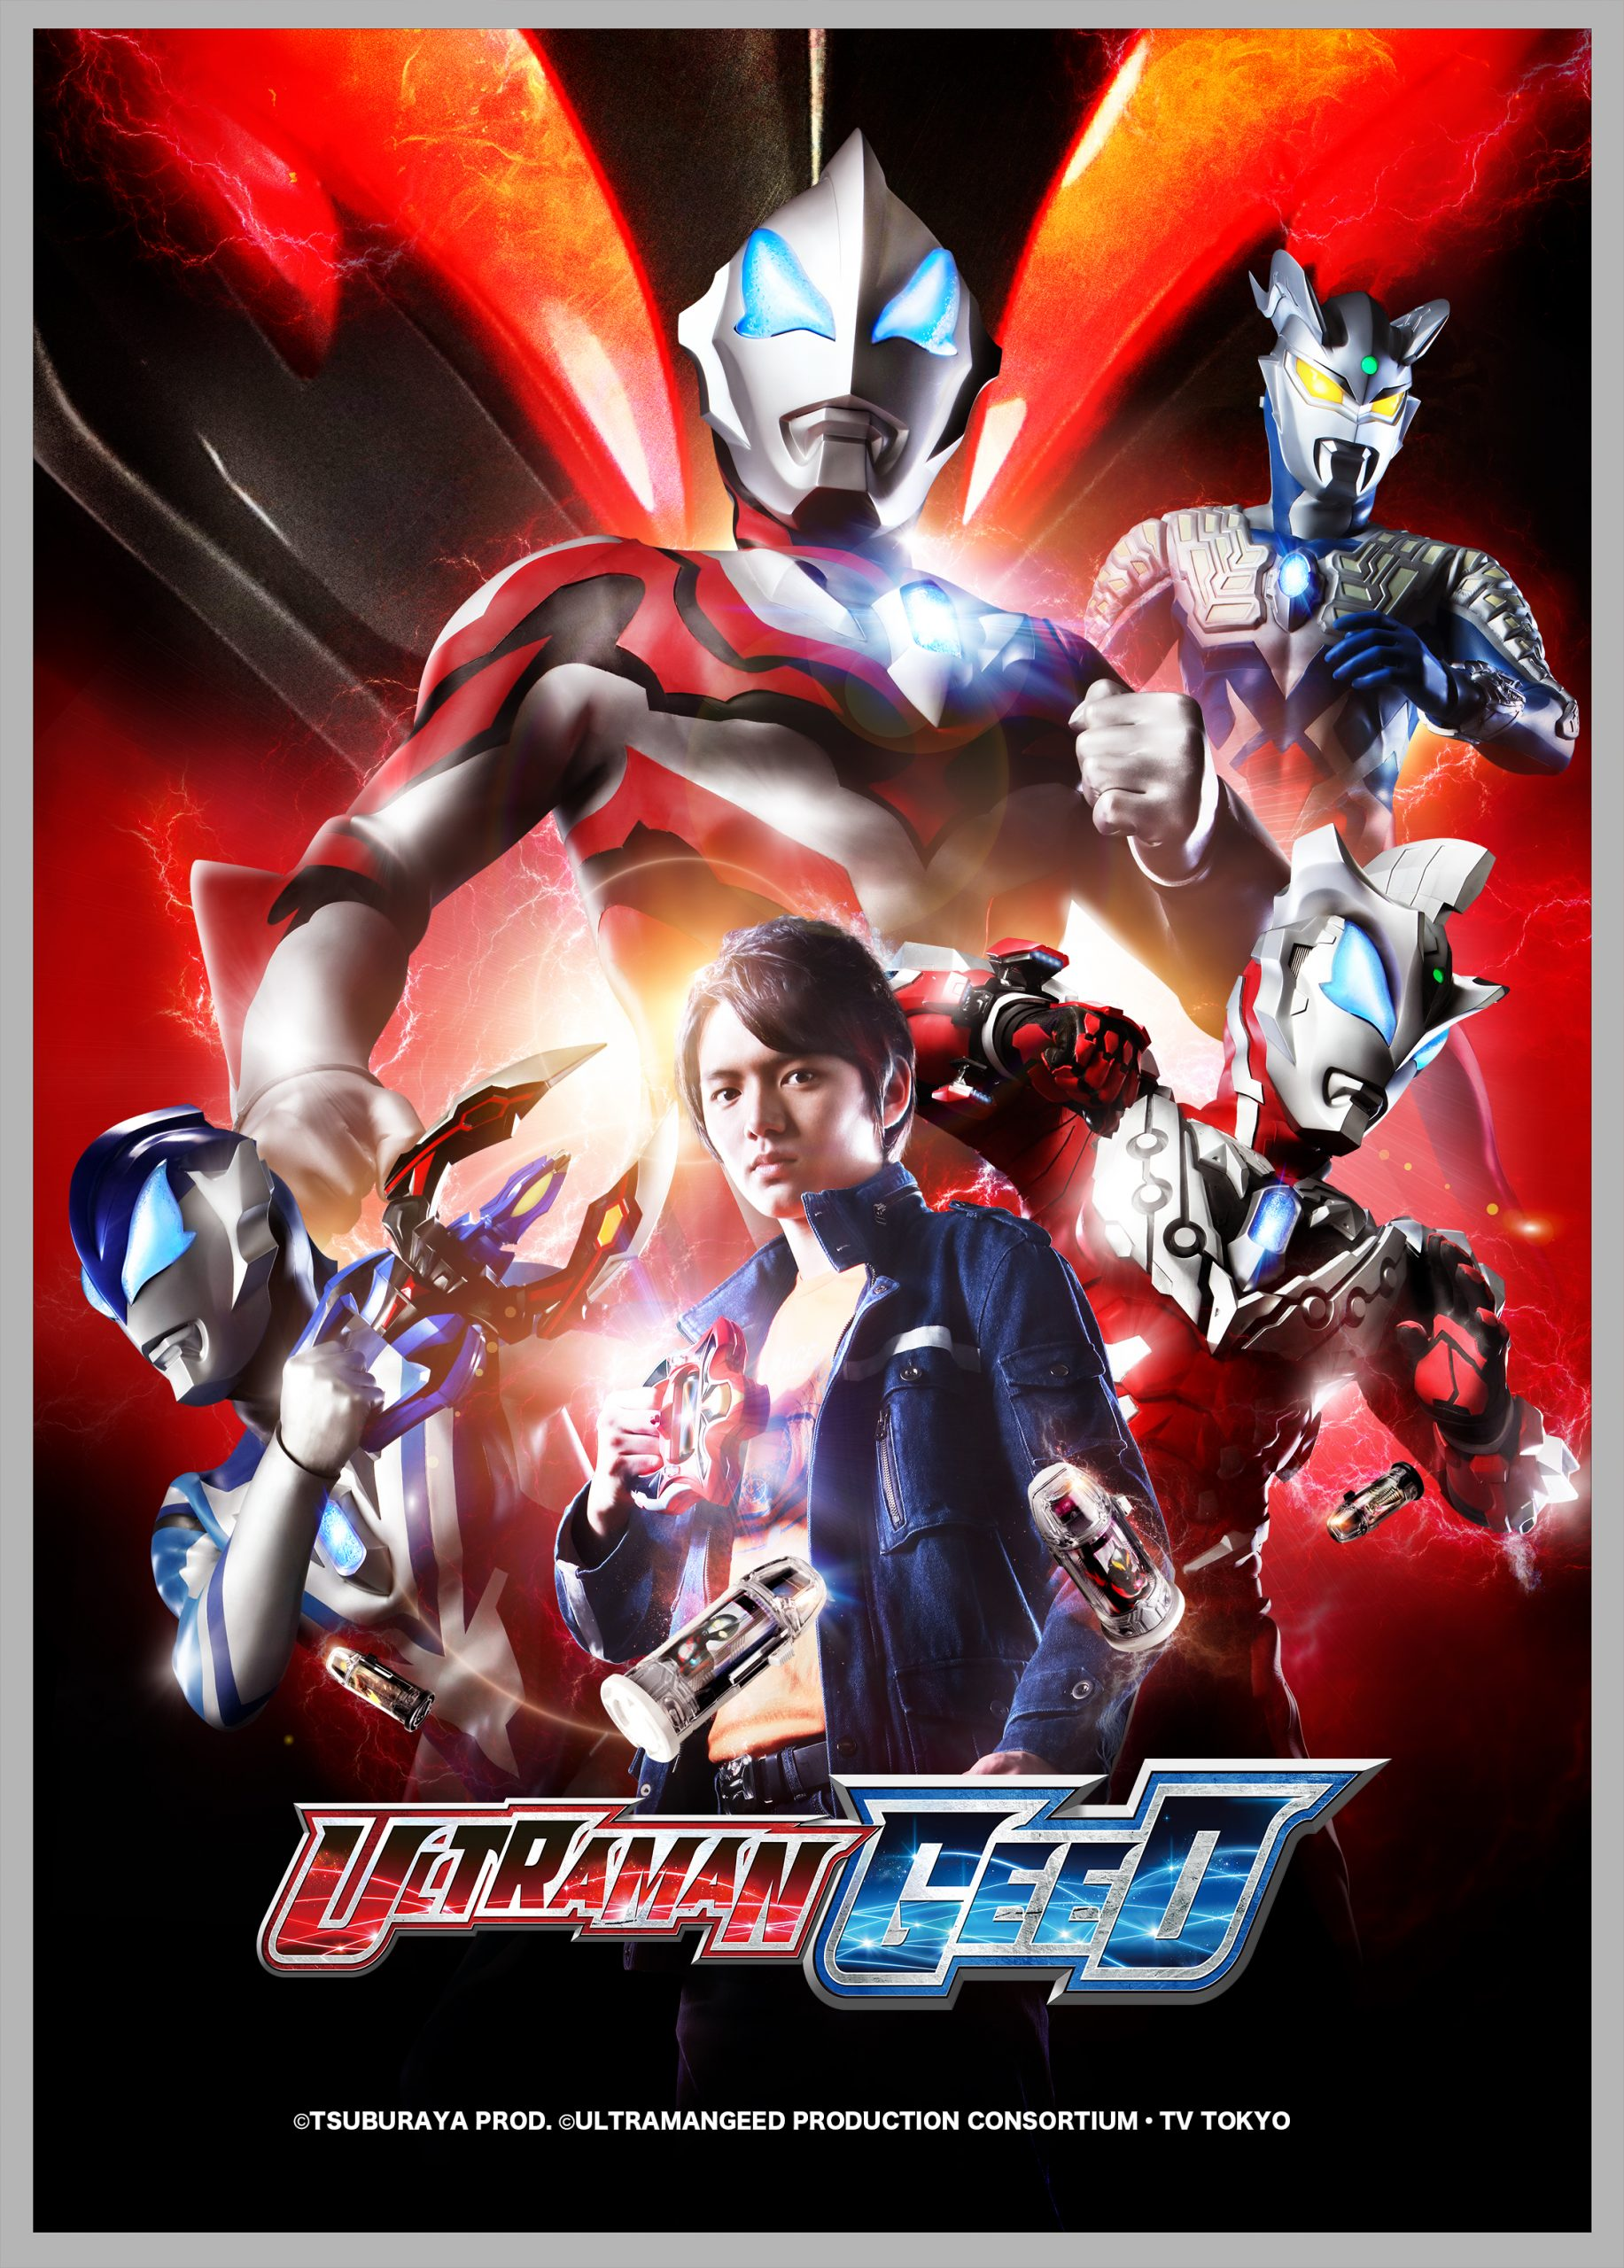 2017 Ultraman Geed 3